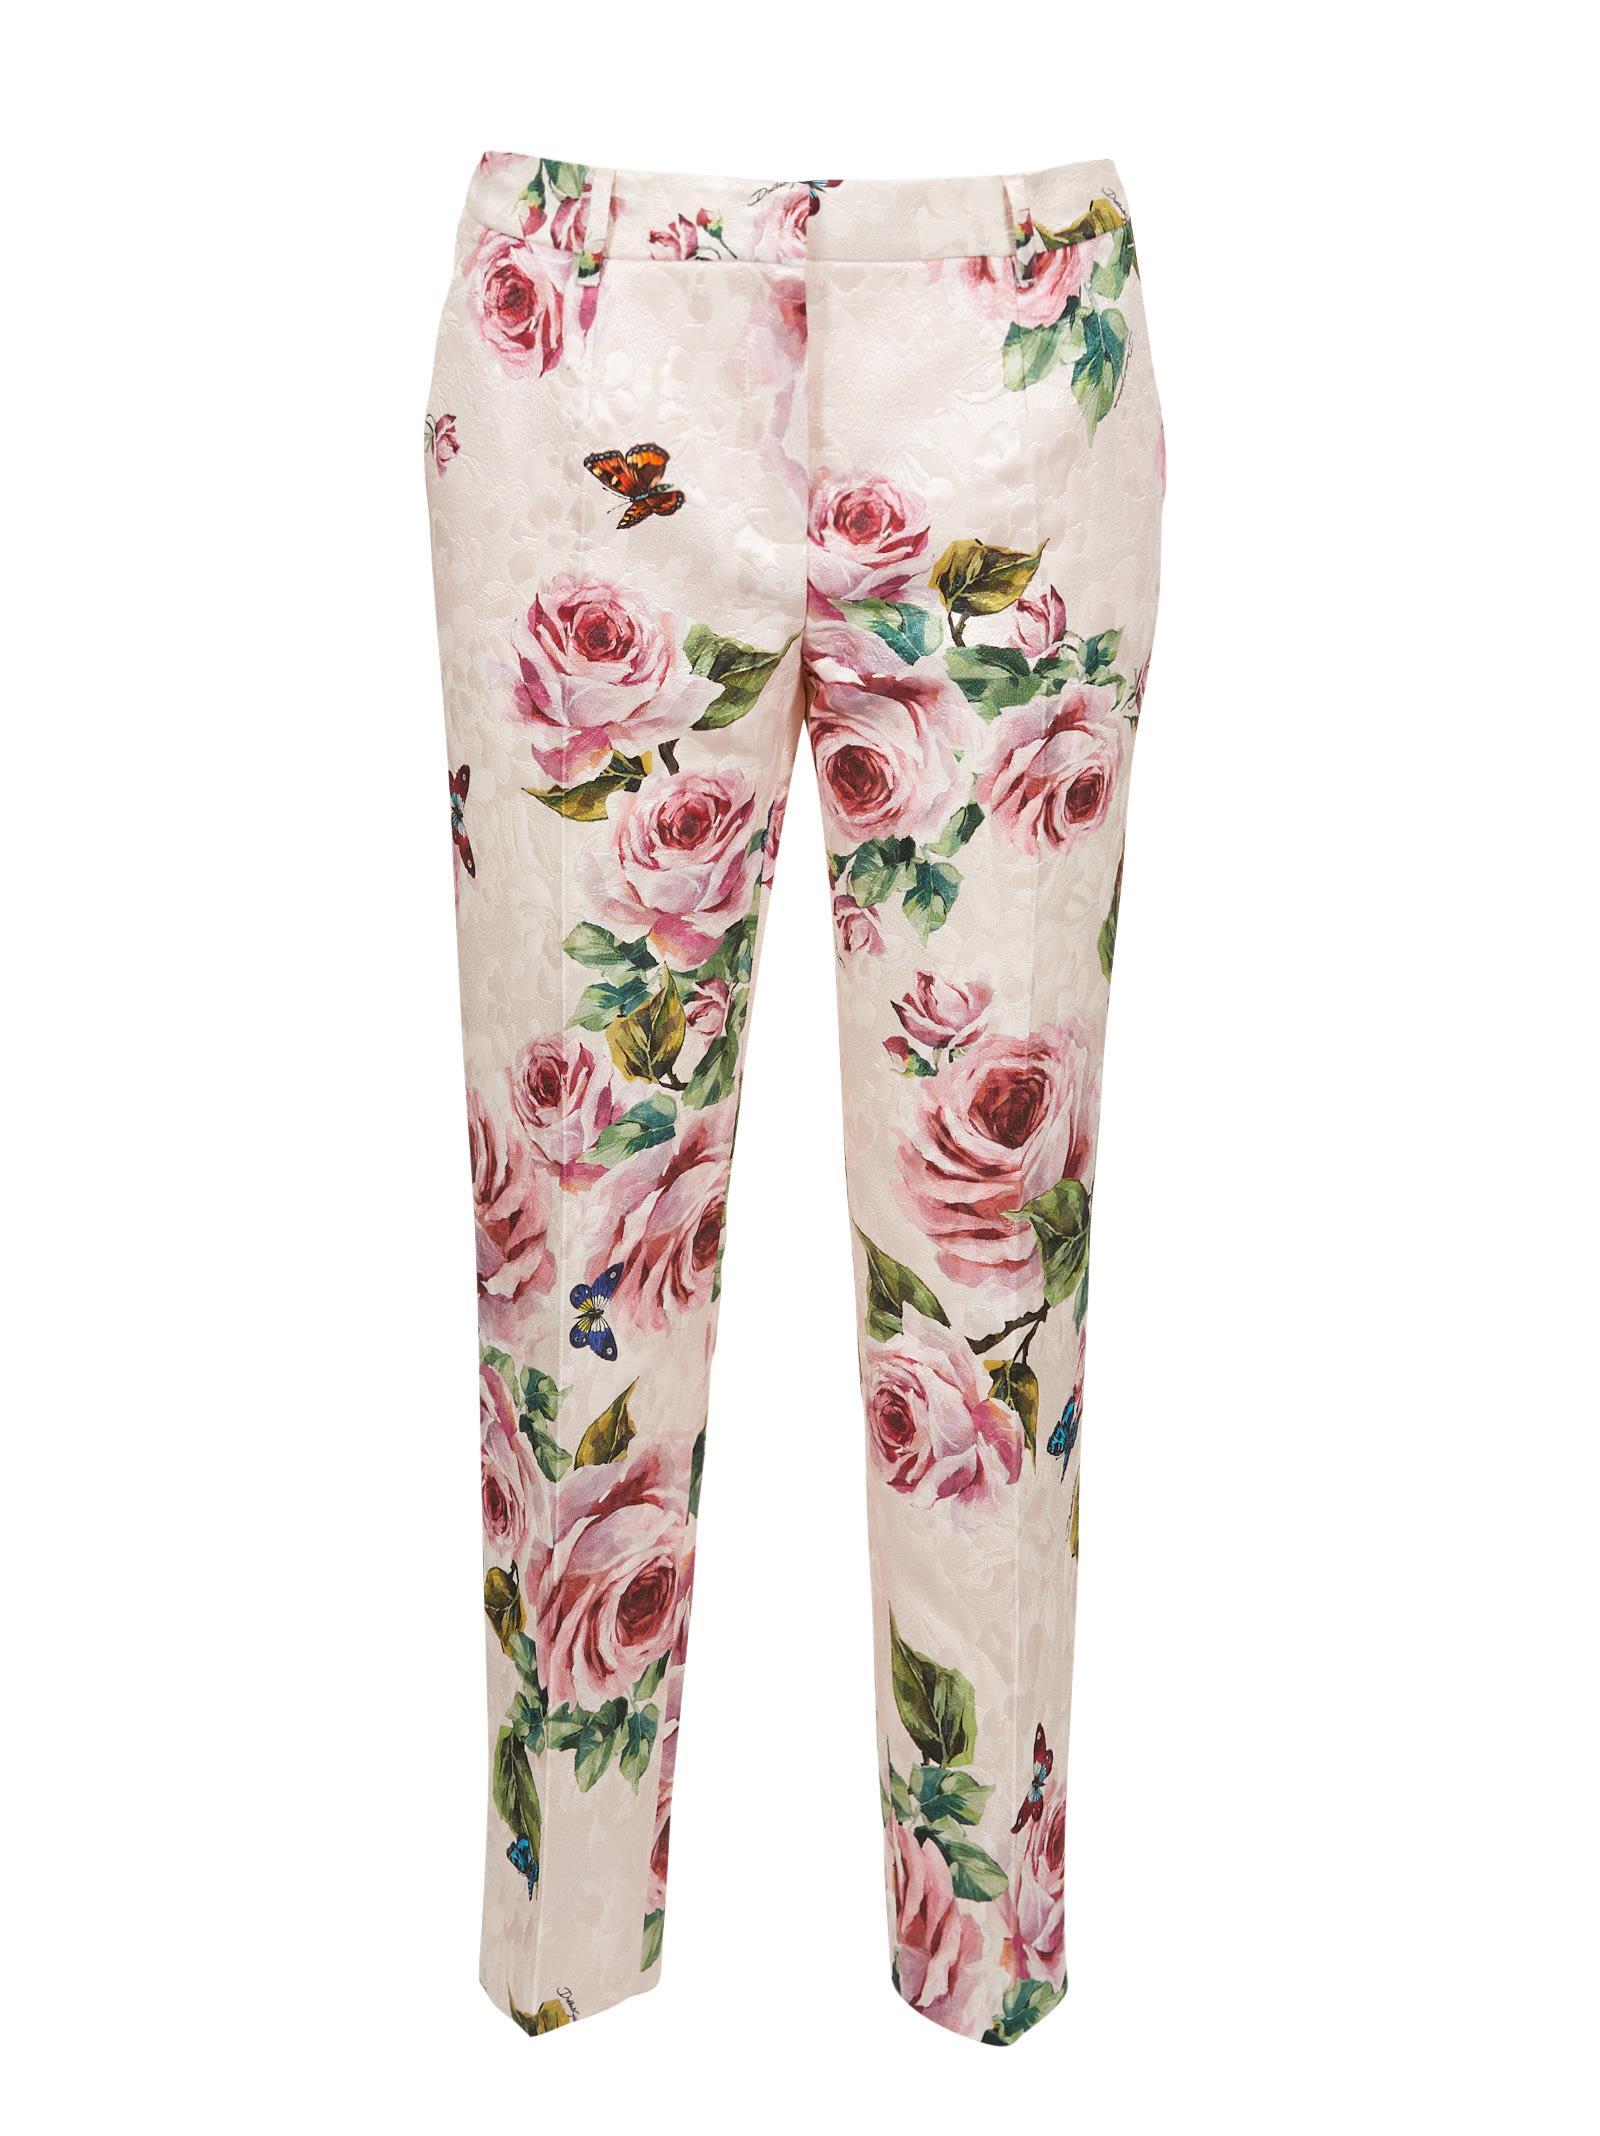 Dolce & Gabbana Rose Print Brocade Trousers